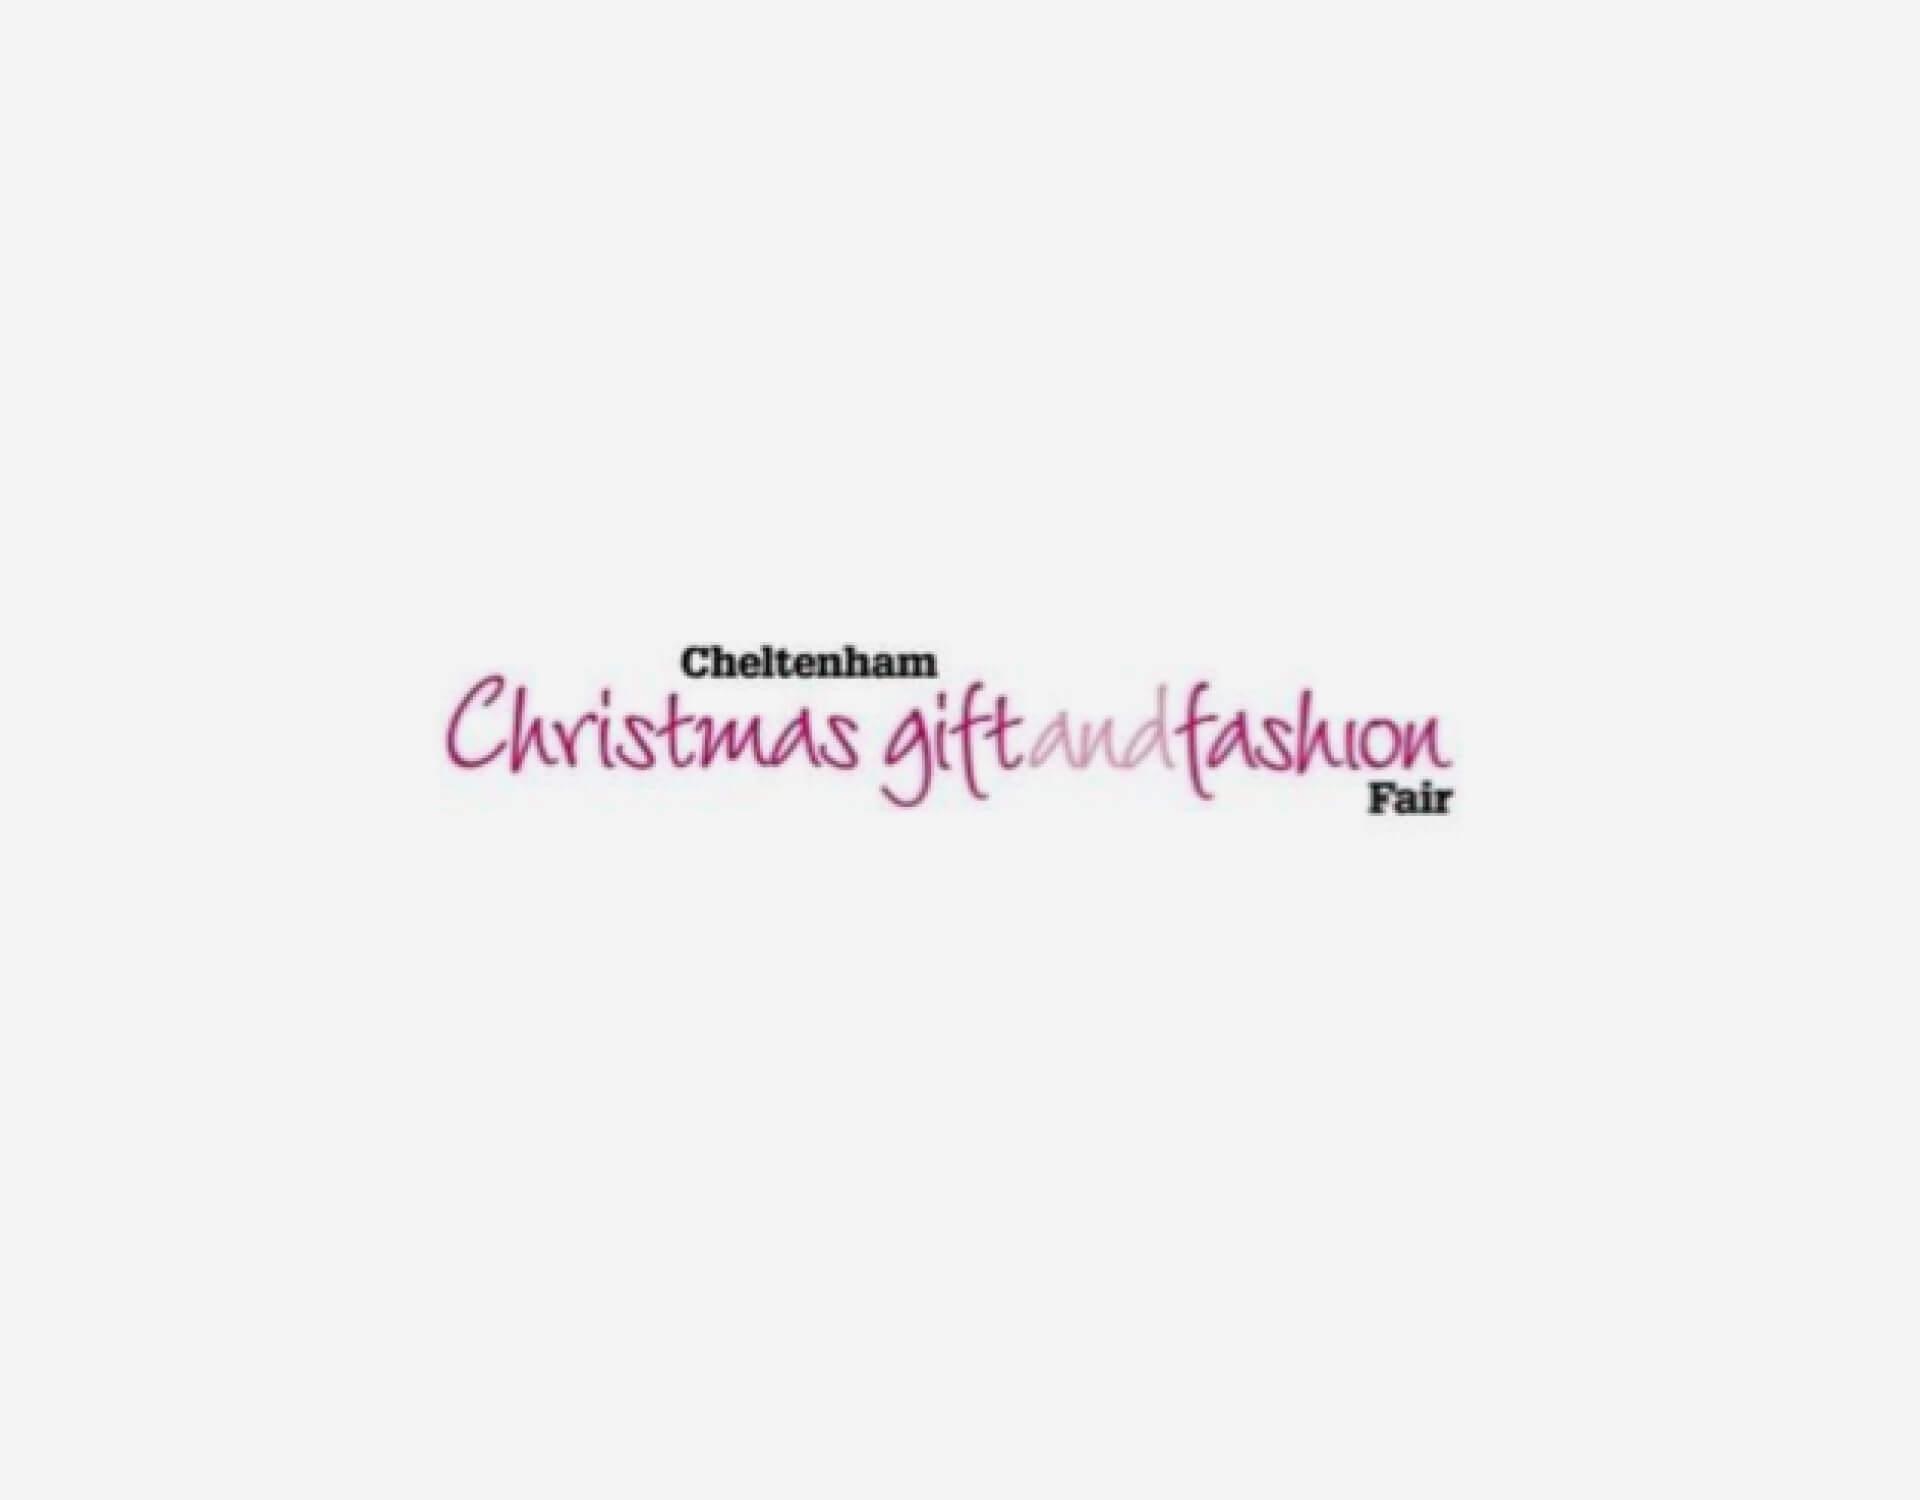 Christmas Gift & Fashion Fair, Cheltenham